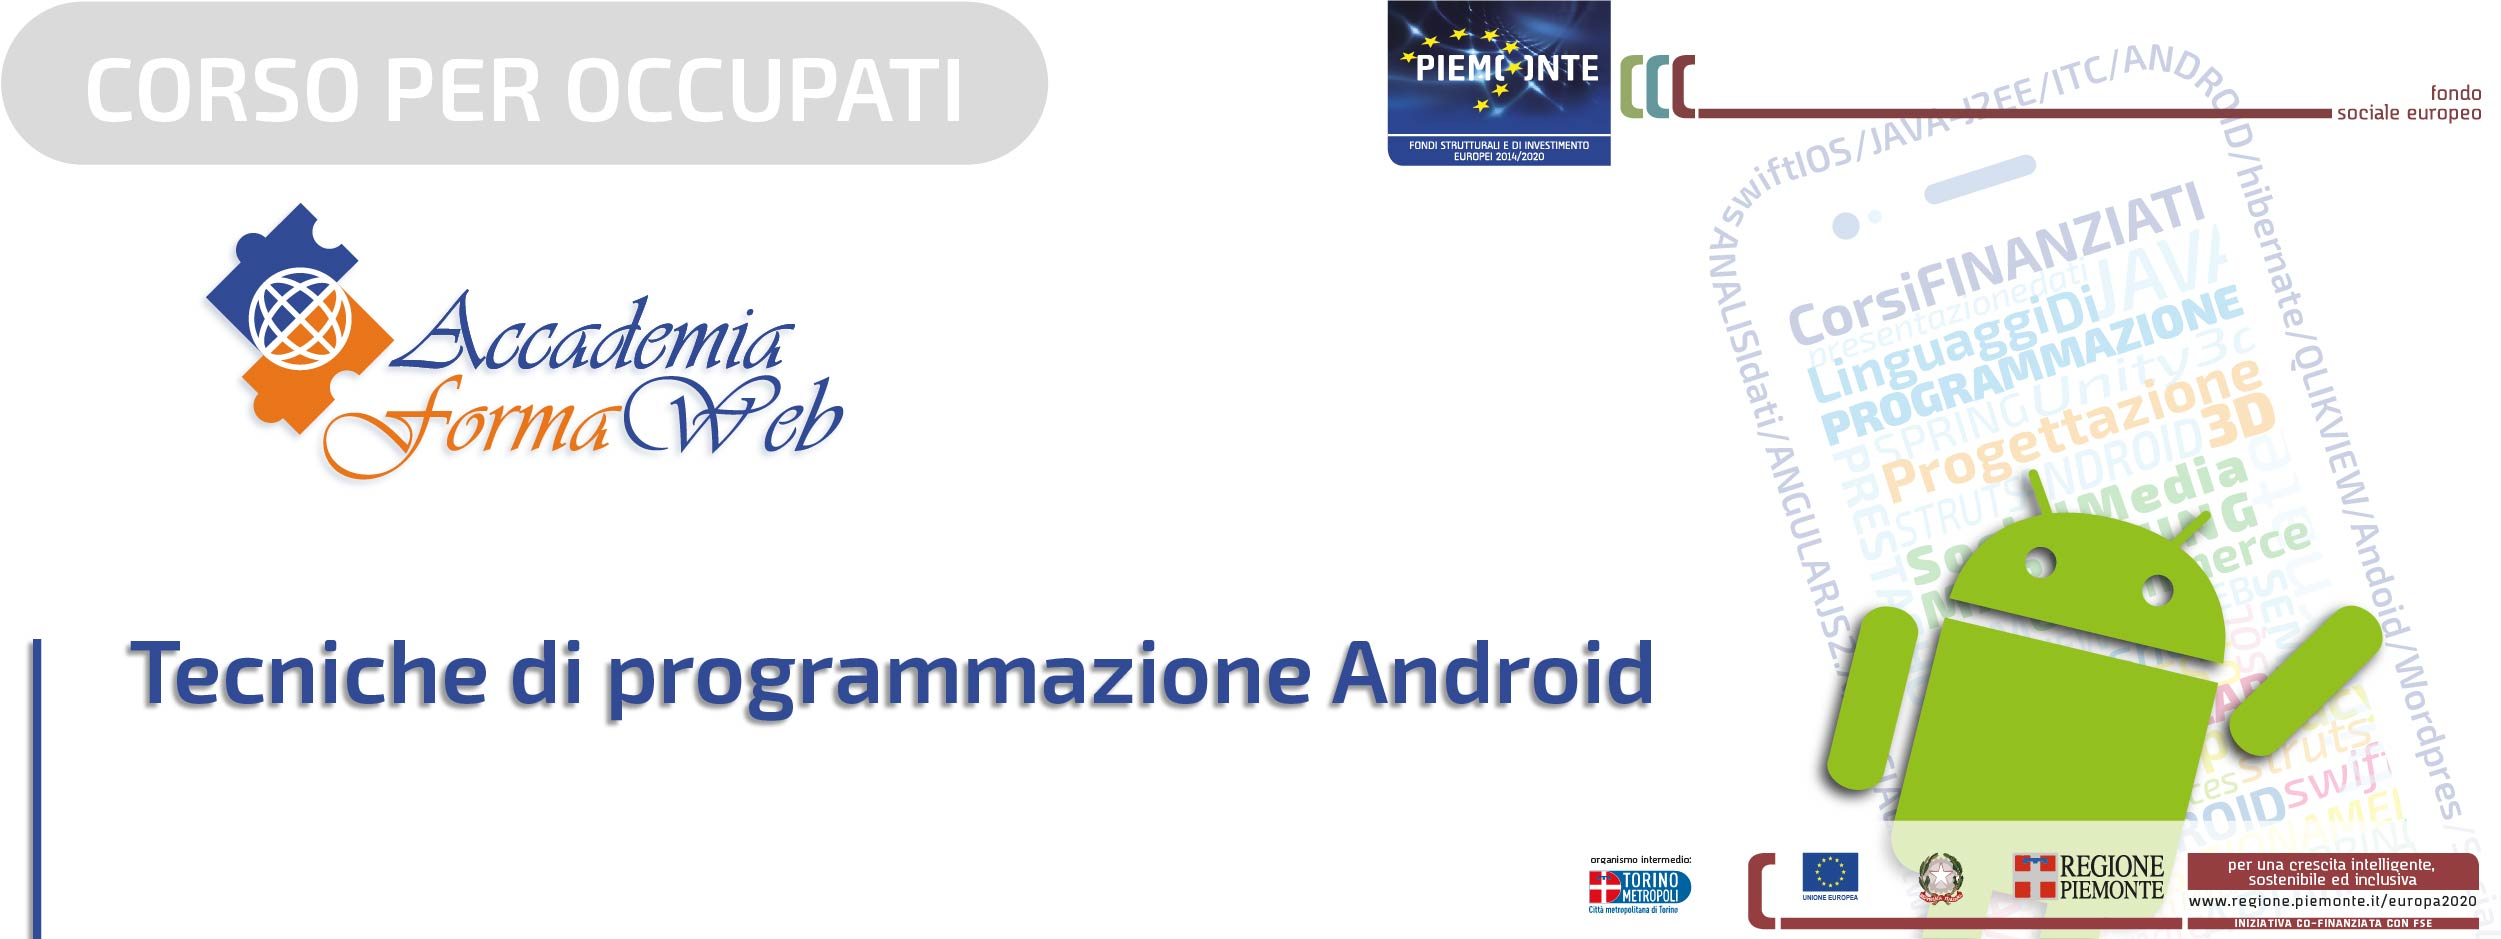 header_Corso Android